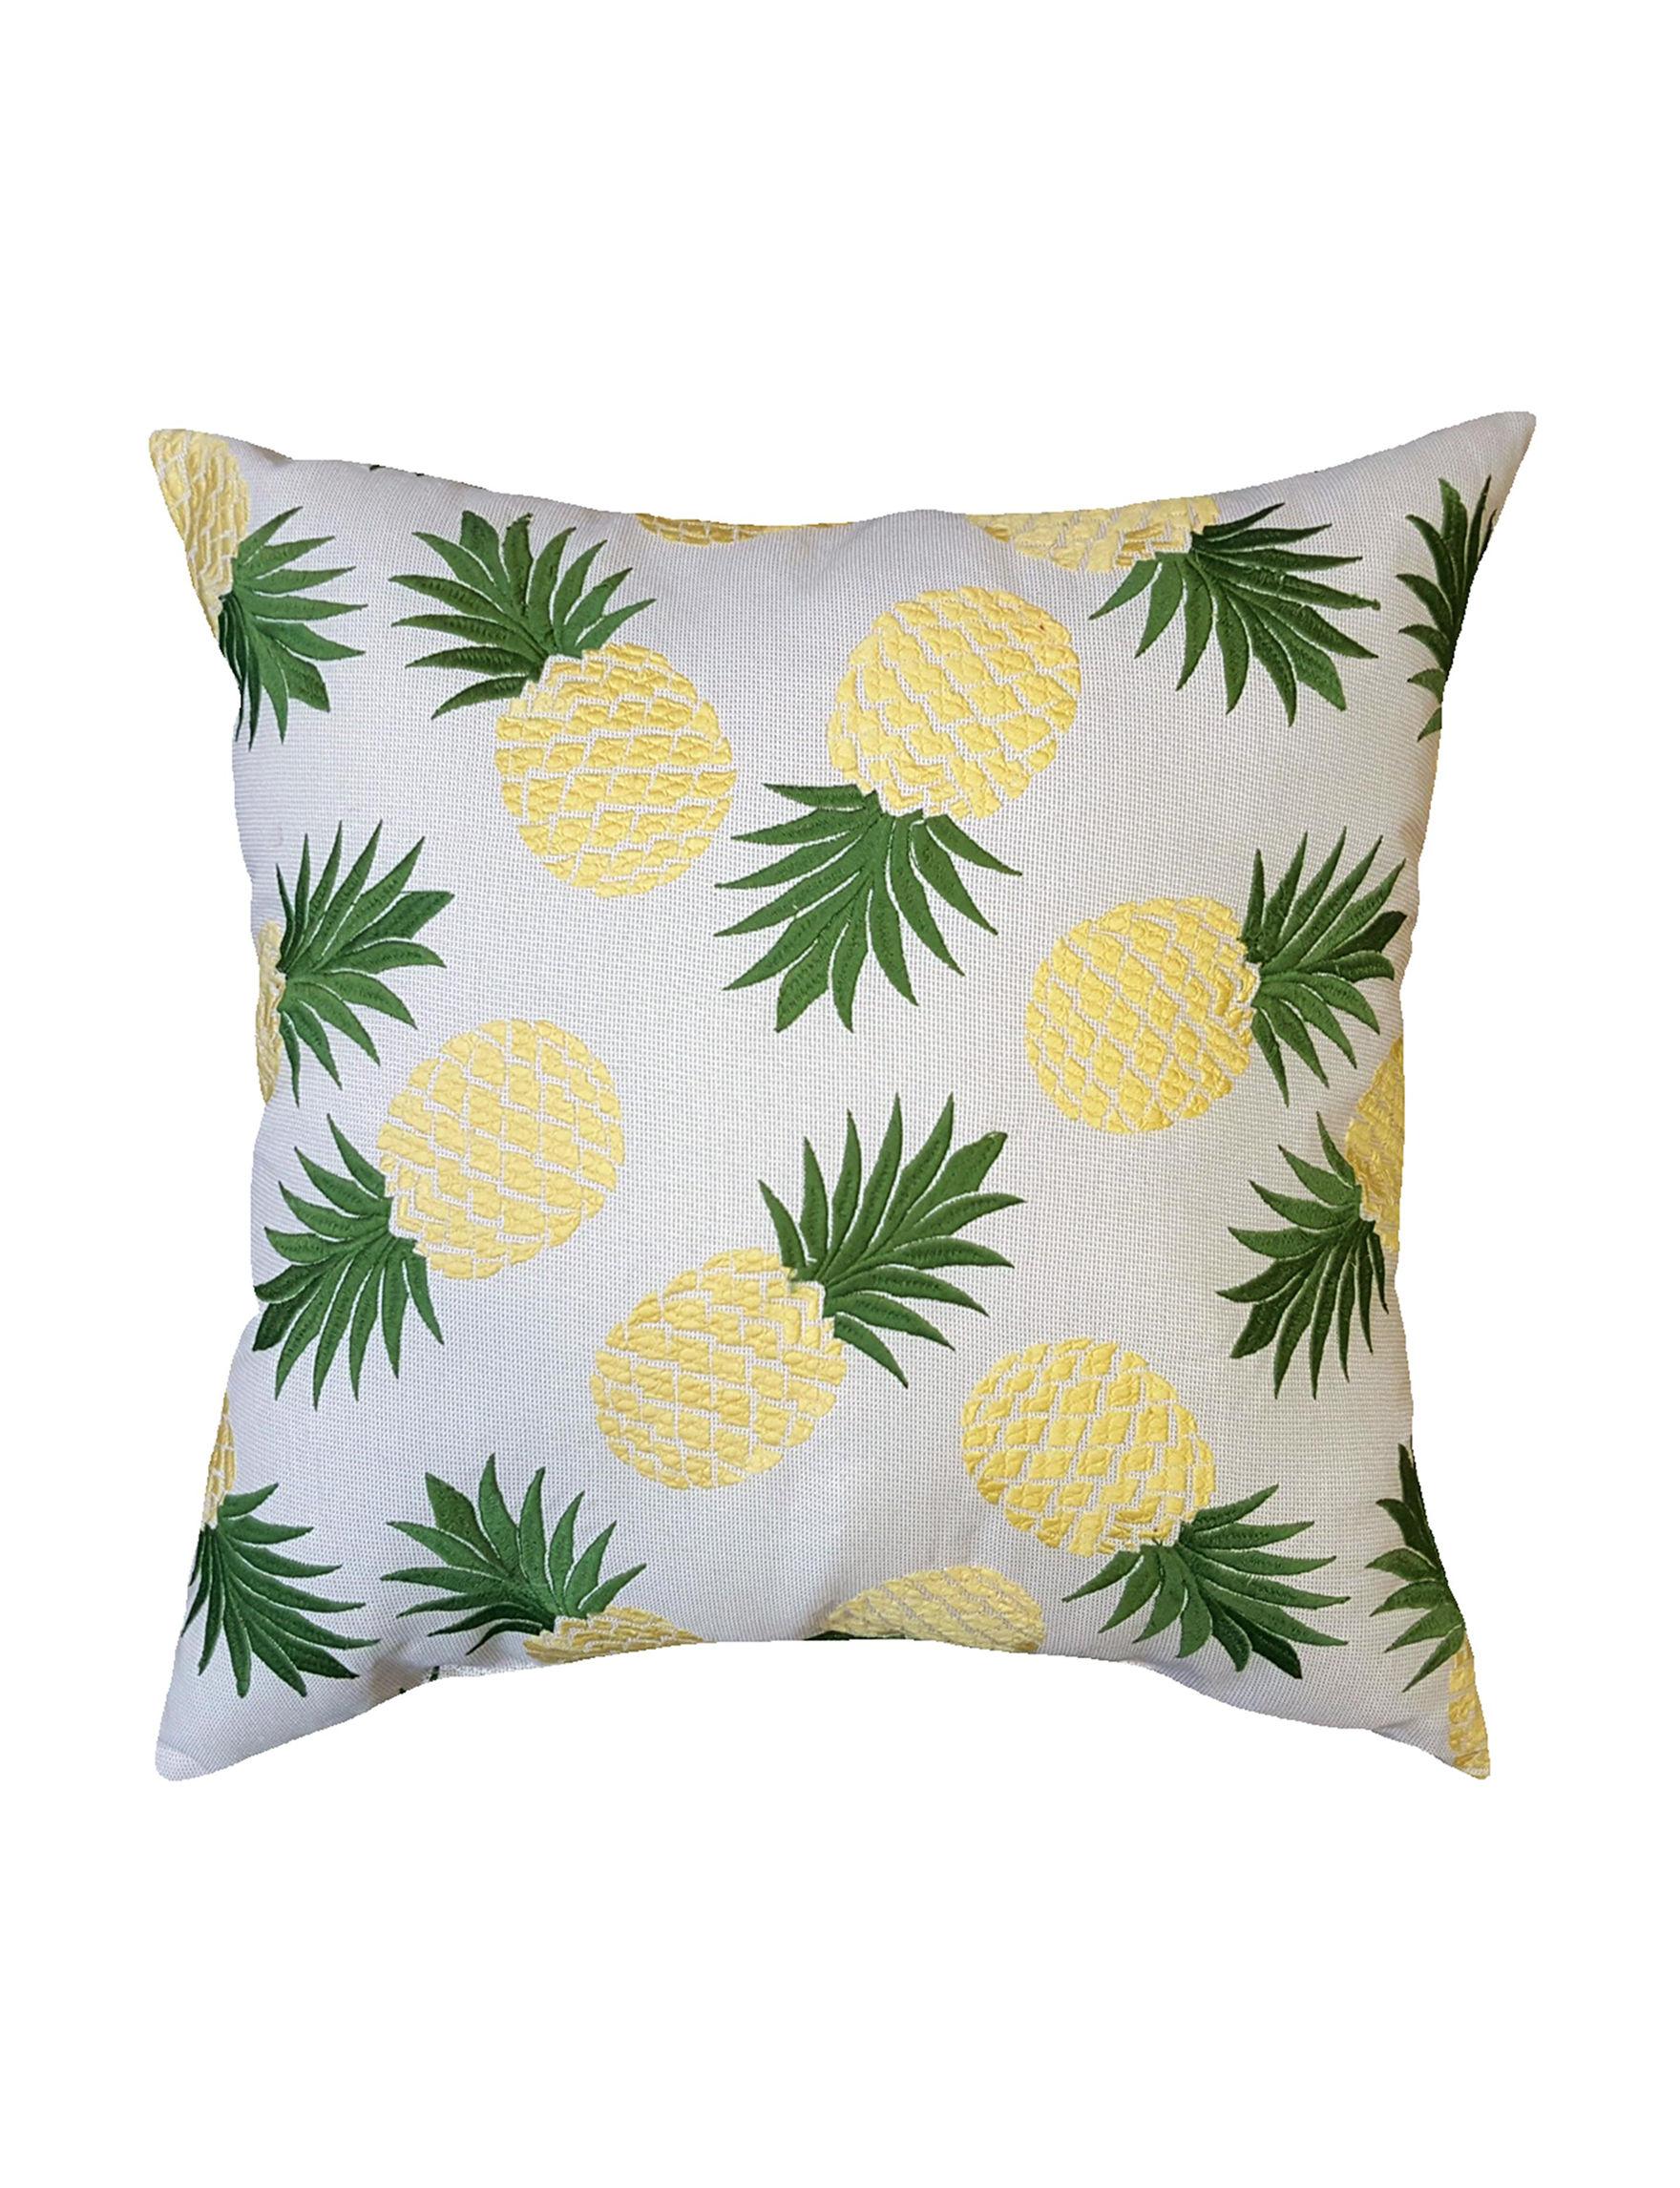 Home Fashions International Yellow Decorative Pillows Outdoor Decor